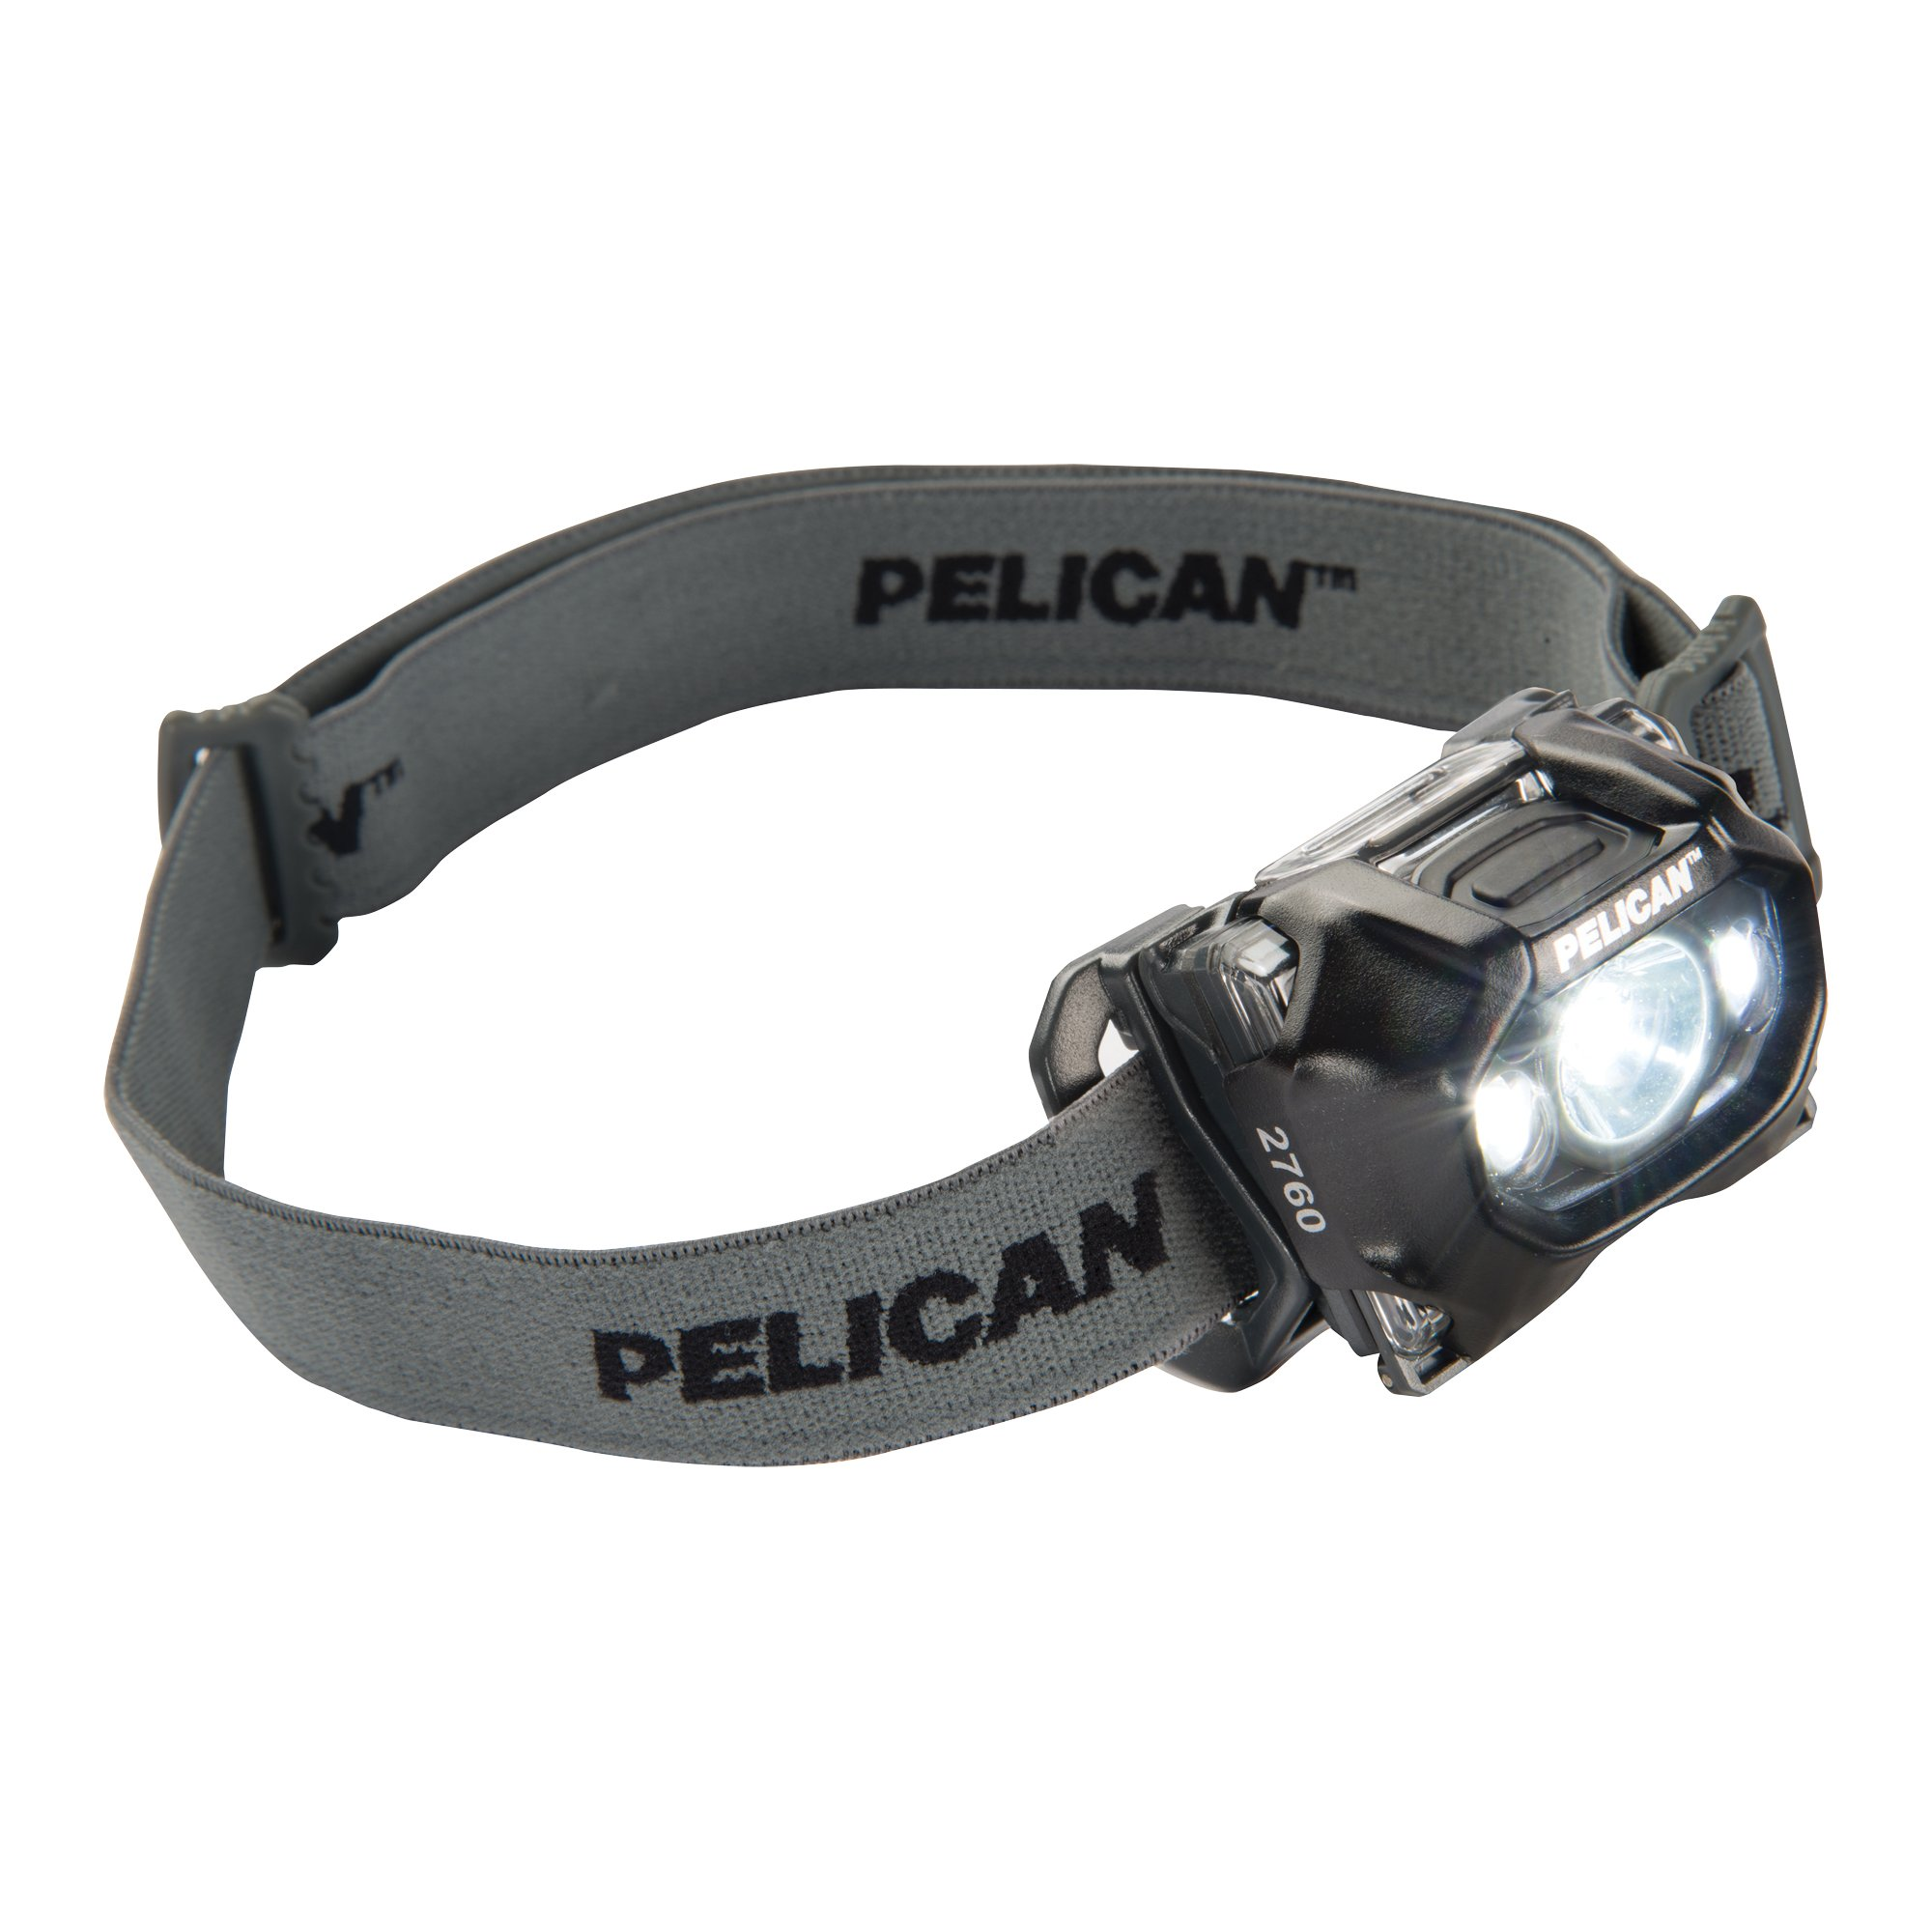 Pelican 2760 Headlamp (Black) by Pelican